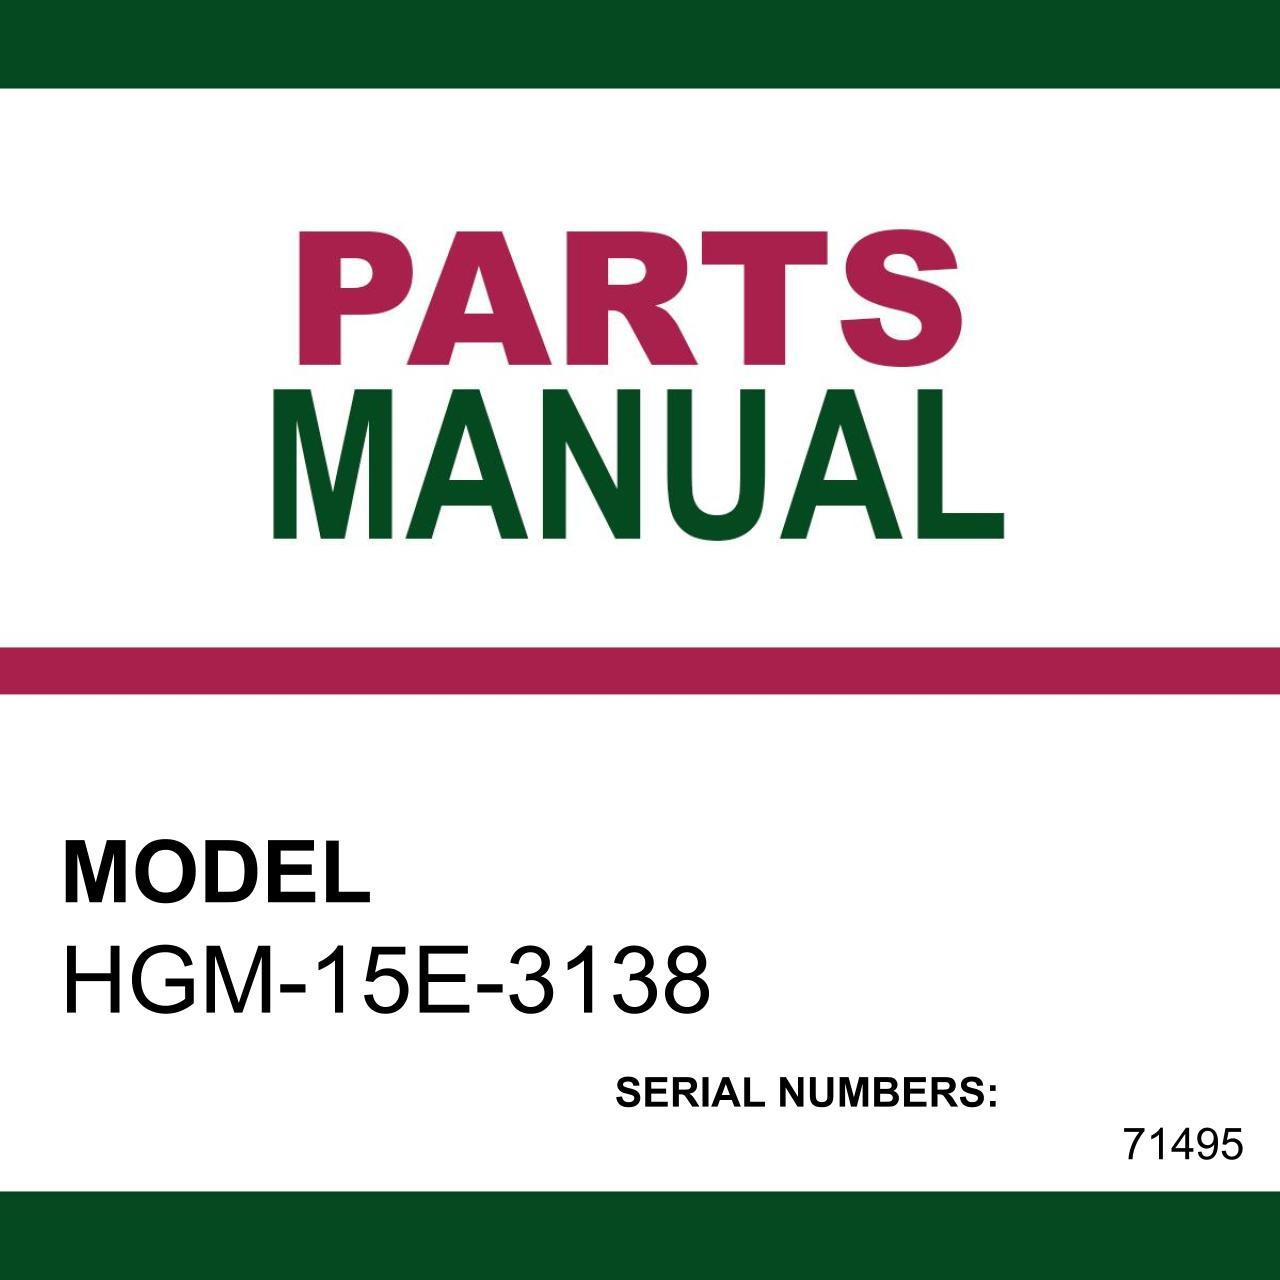 Hydro-Gear-HGM-15E-3138-owners-manual.jpg